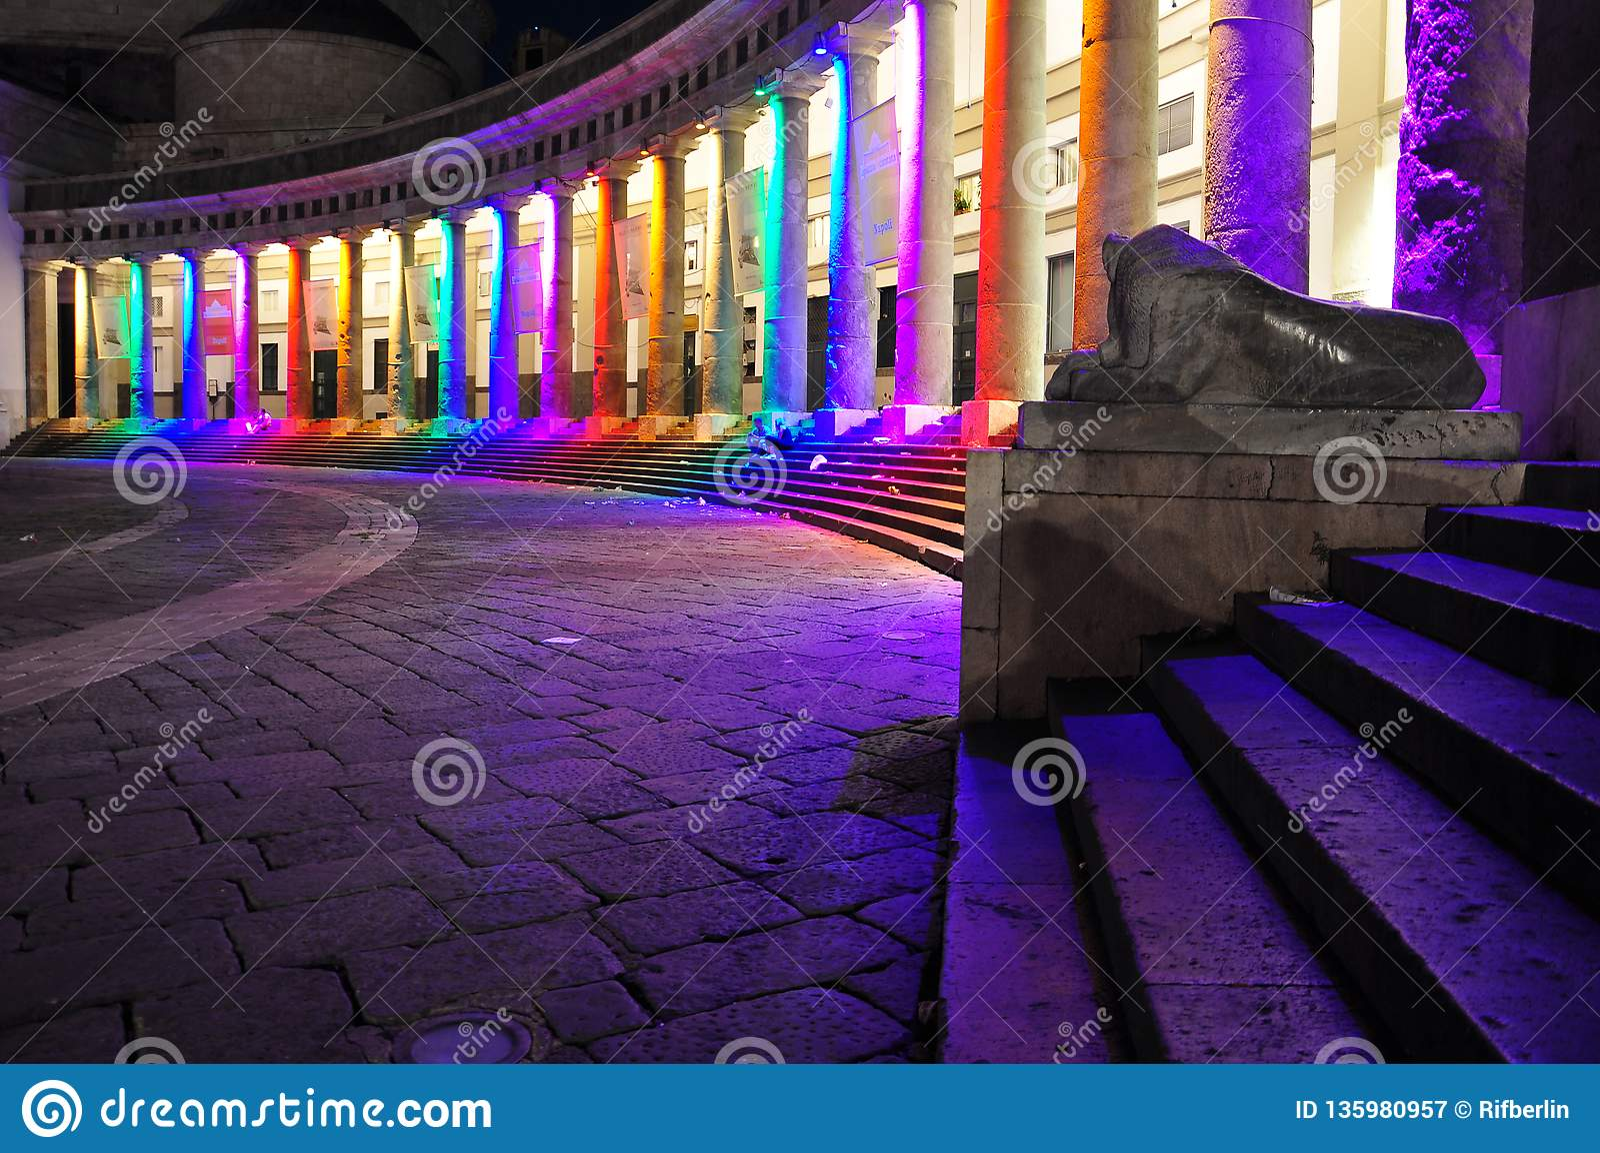 City of Naples, Piazza Plebiscito at night, gay pride